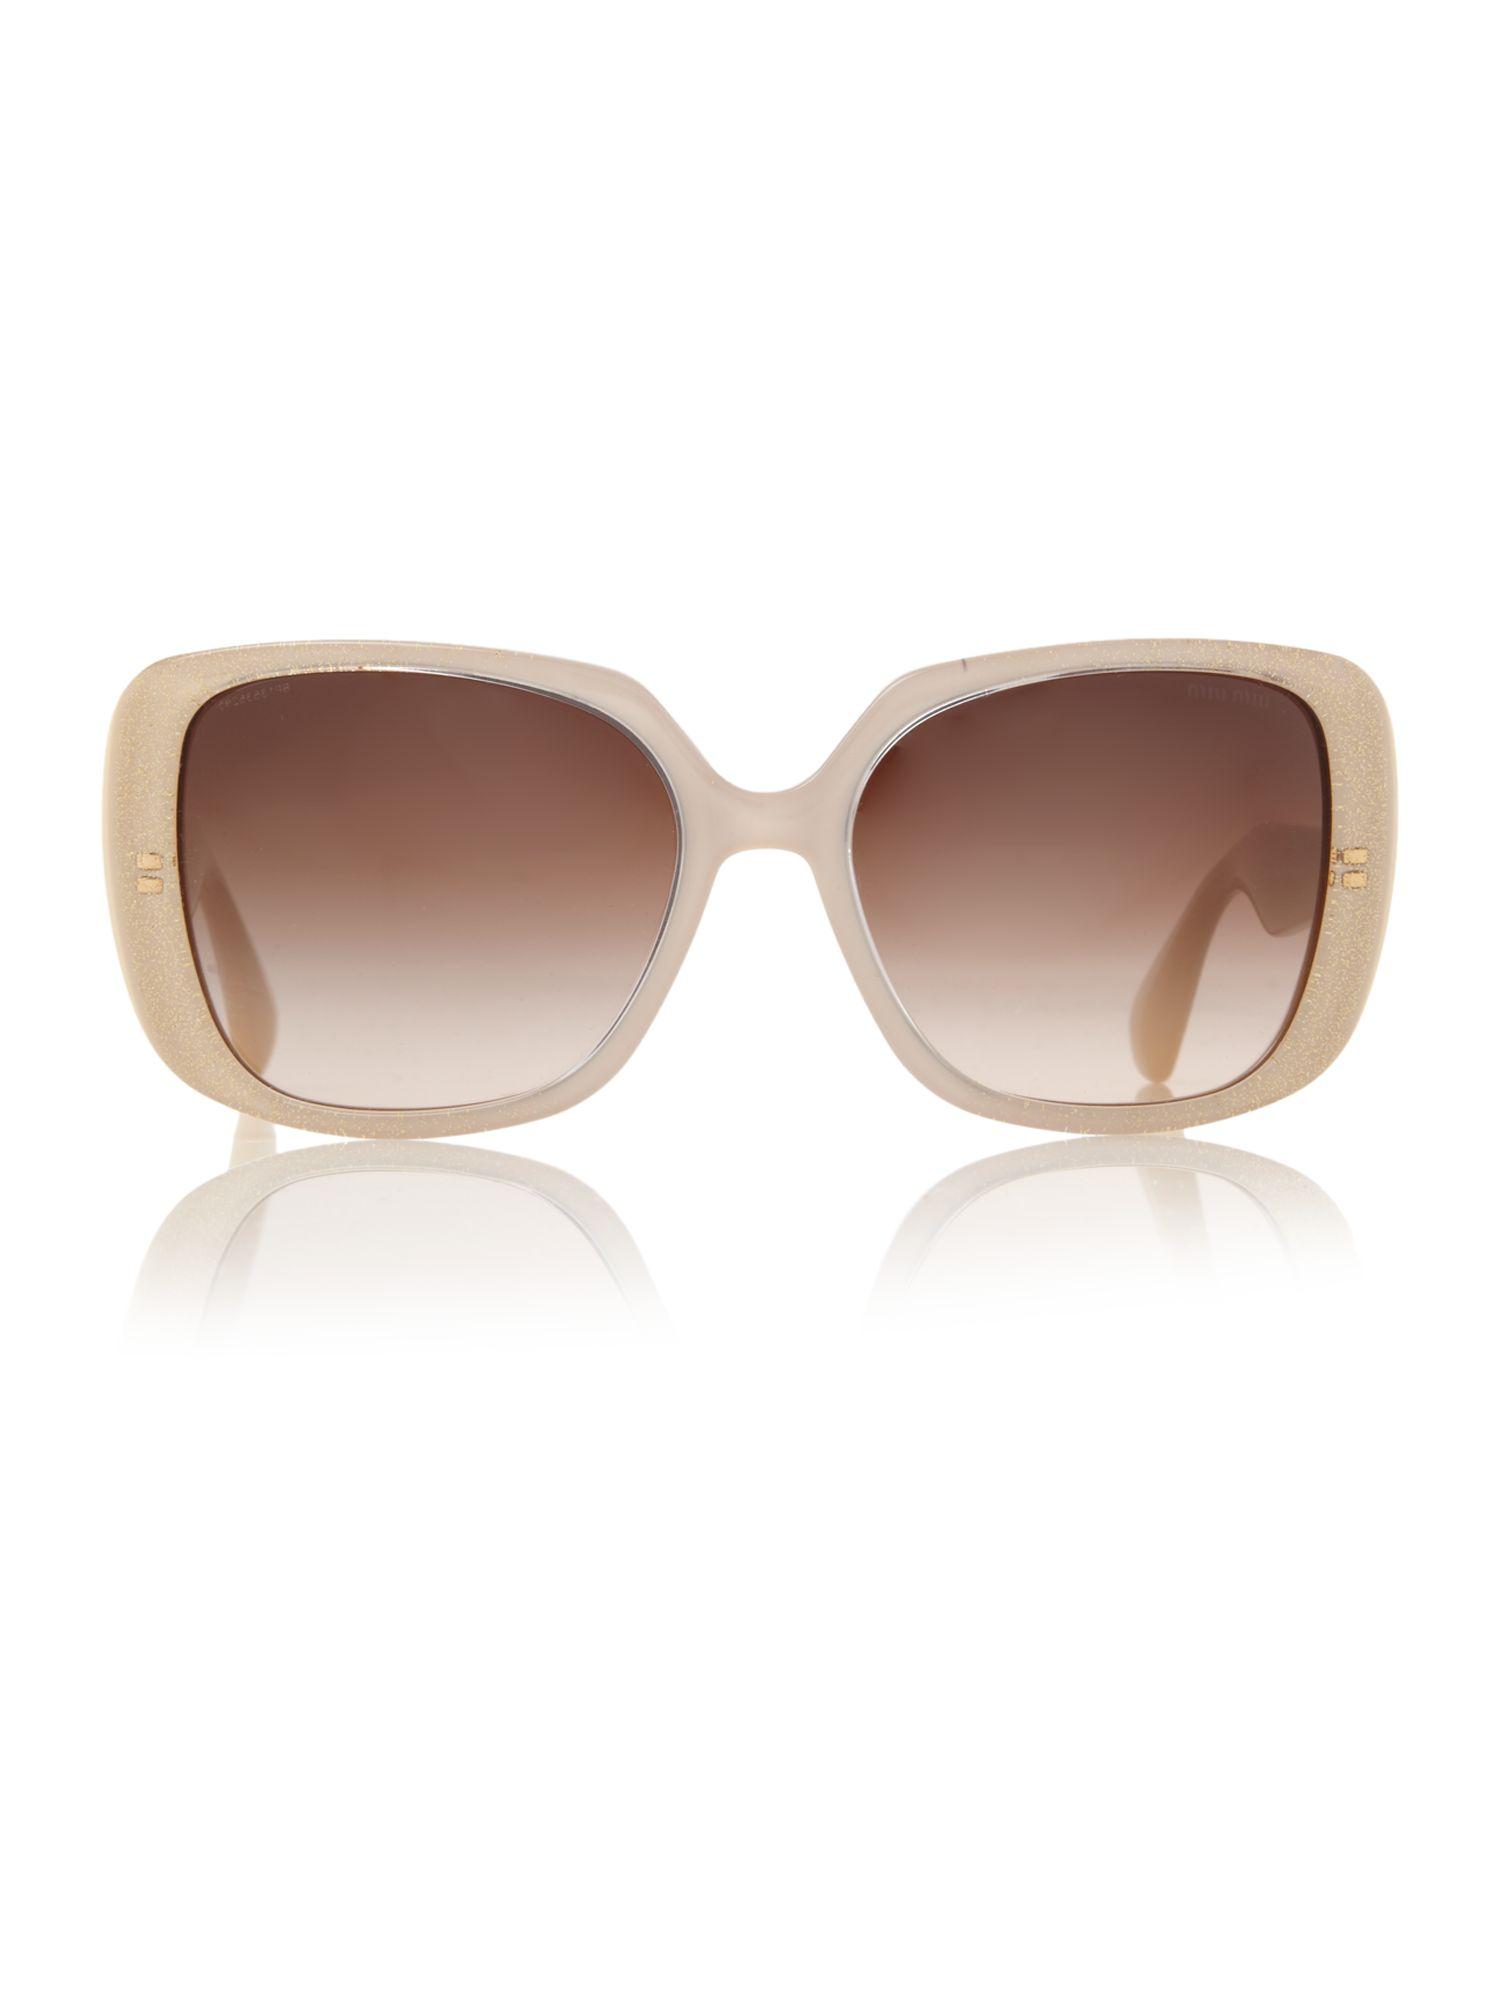 Miu Miu Ladies Mu 02ns Sunglasses in Tan (Natural)